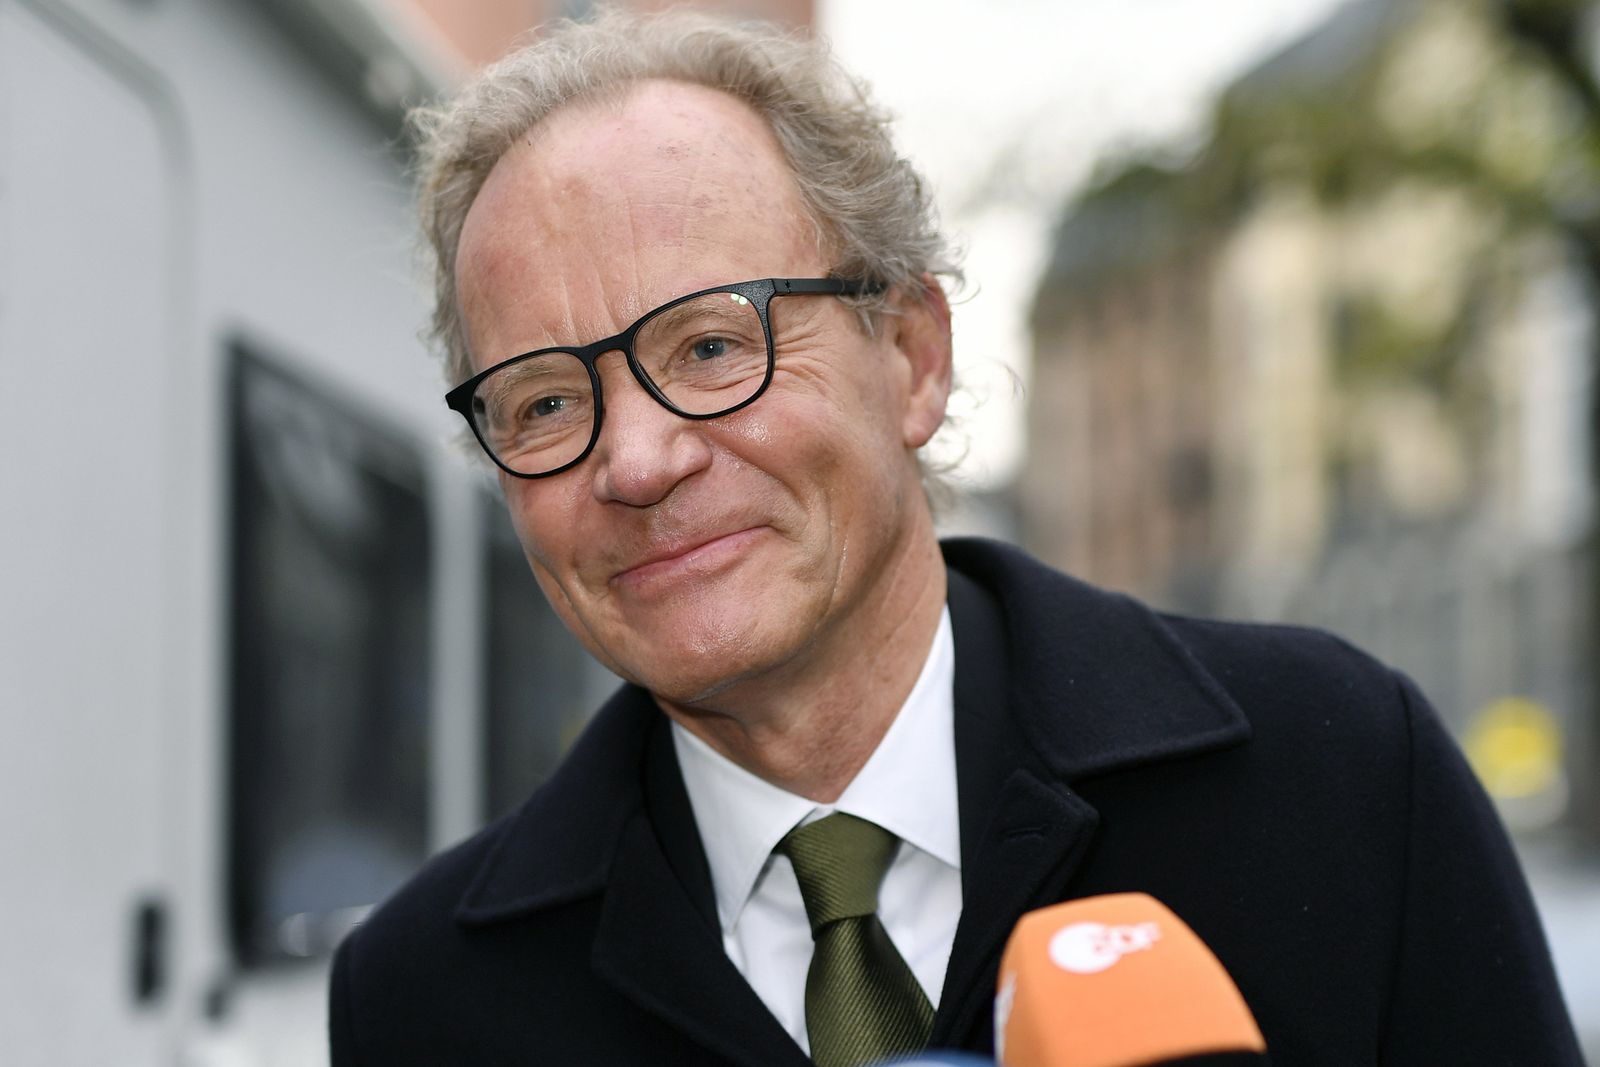 Anwalt Eckart Seith freigesproch